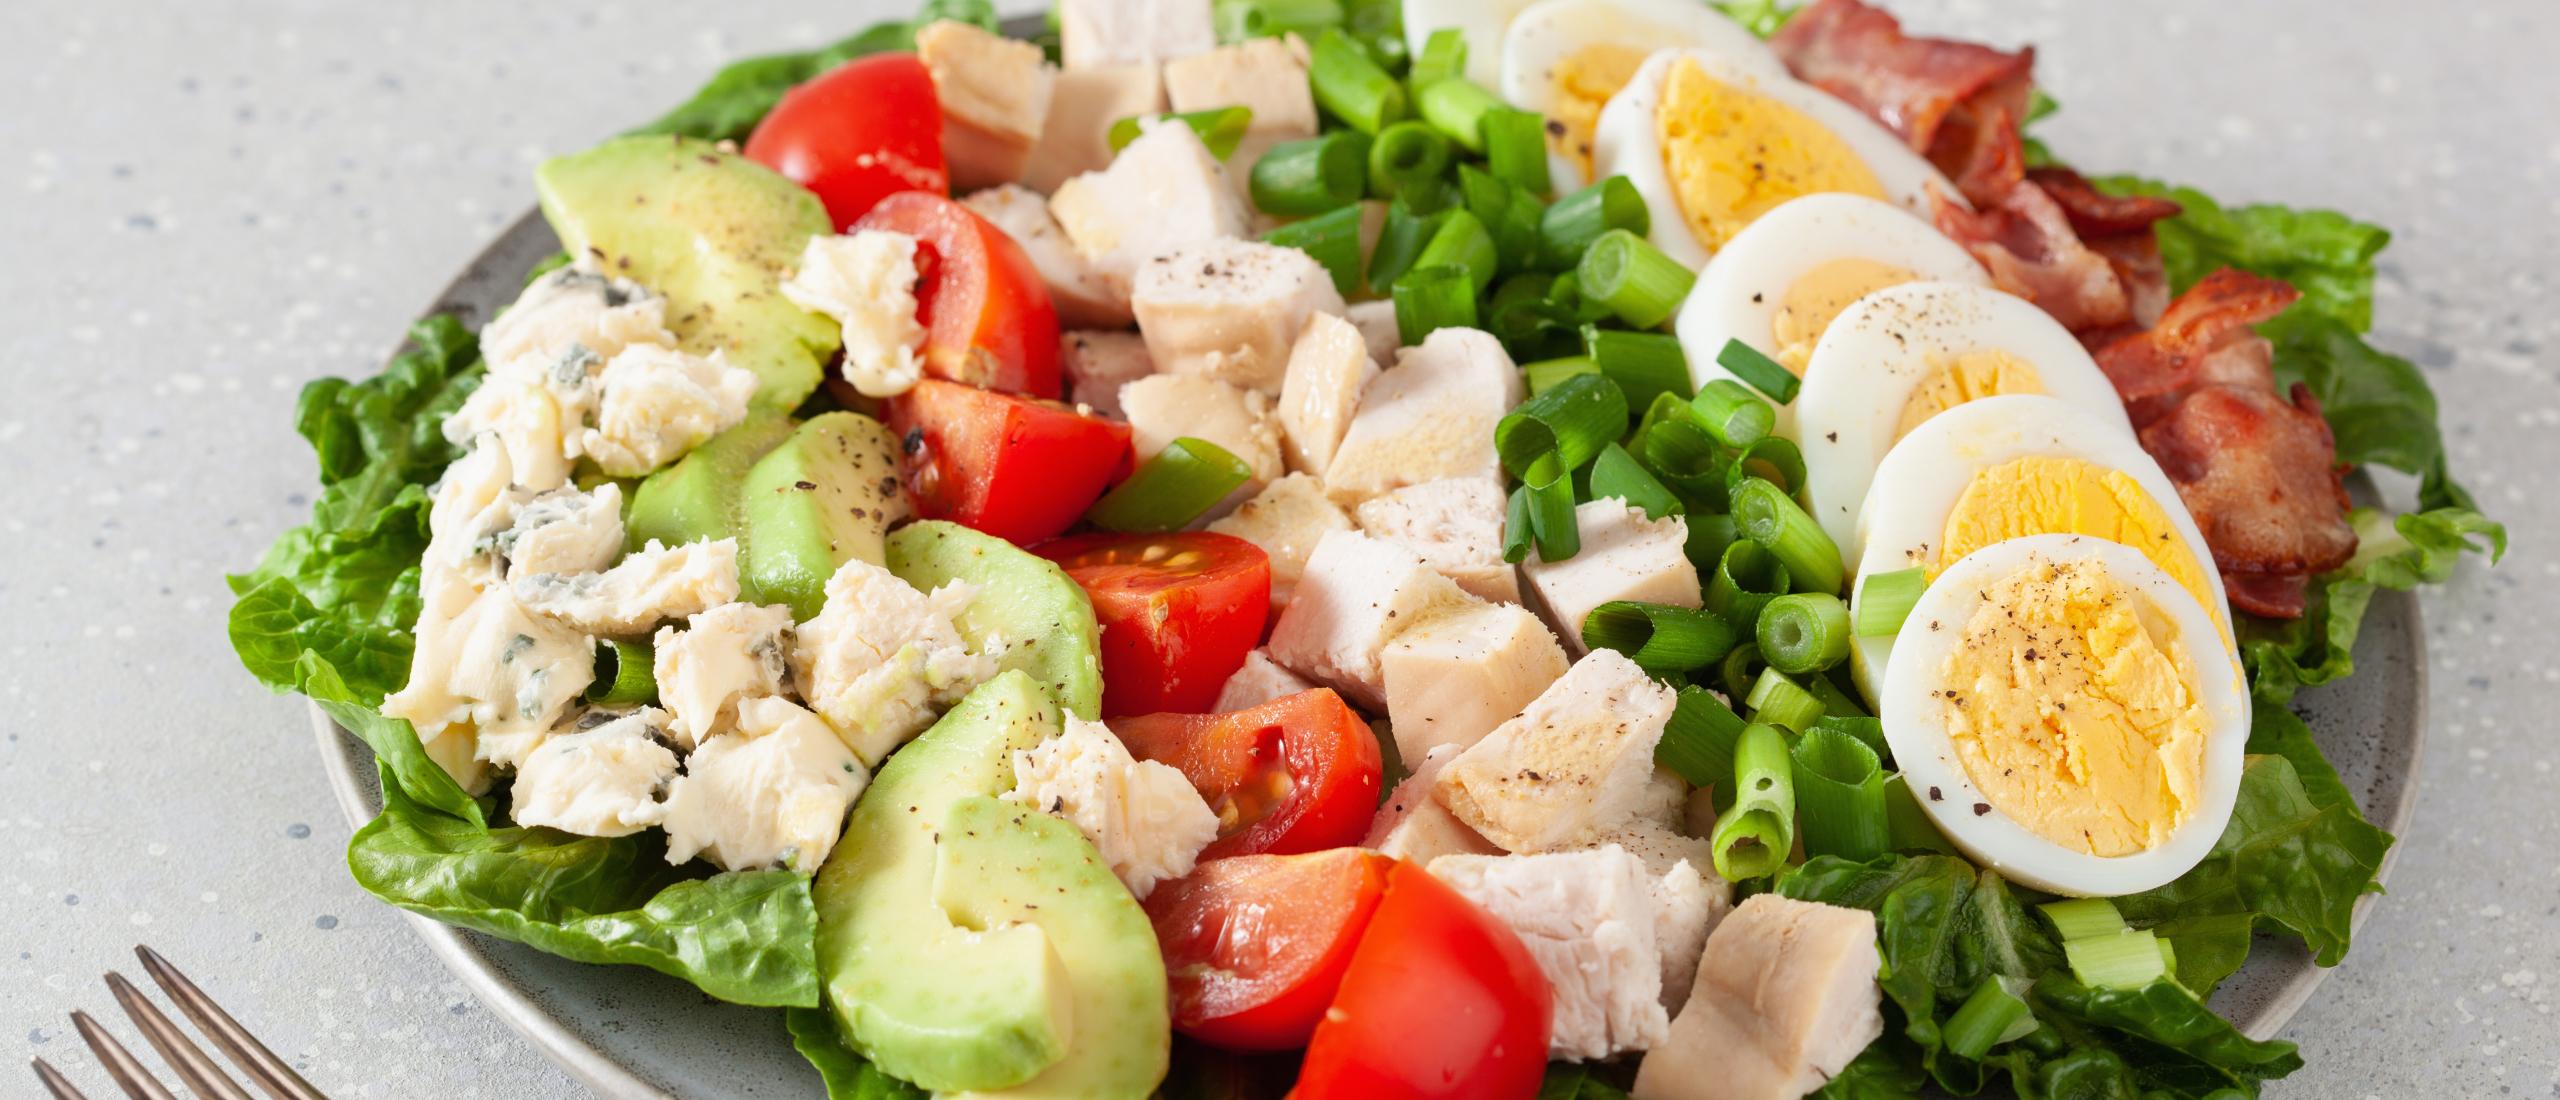 BLT Salade met Kruidige Ranch Dressing